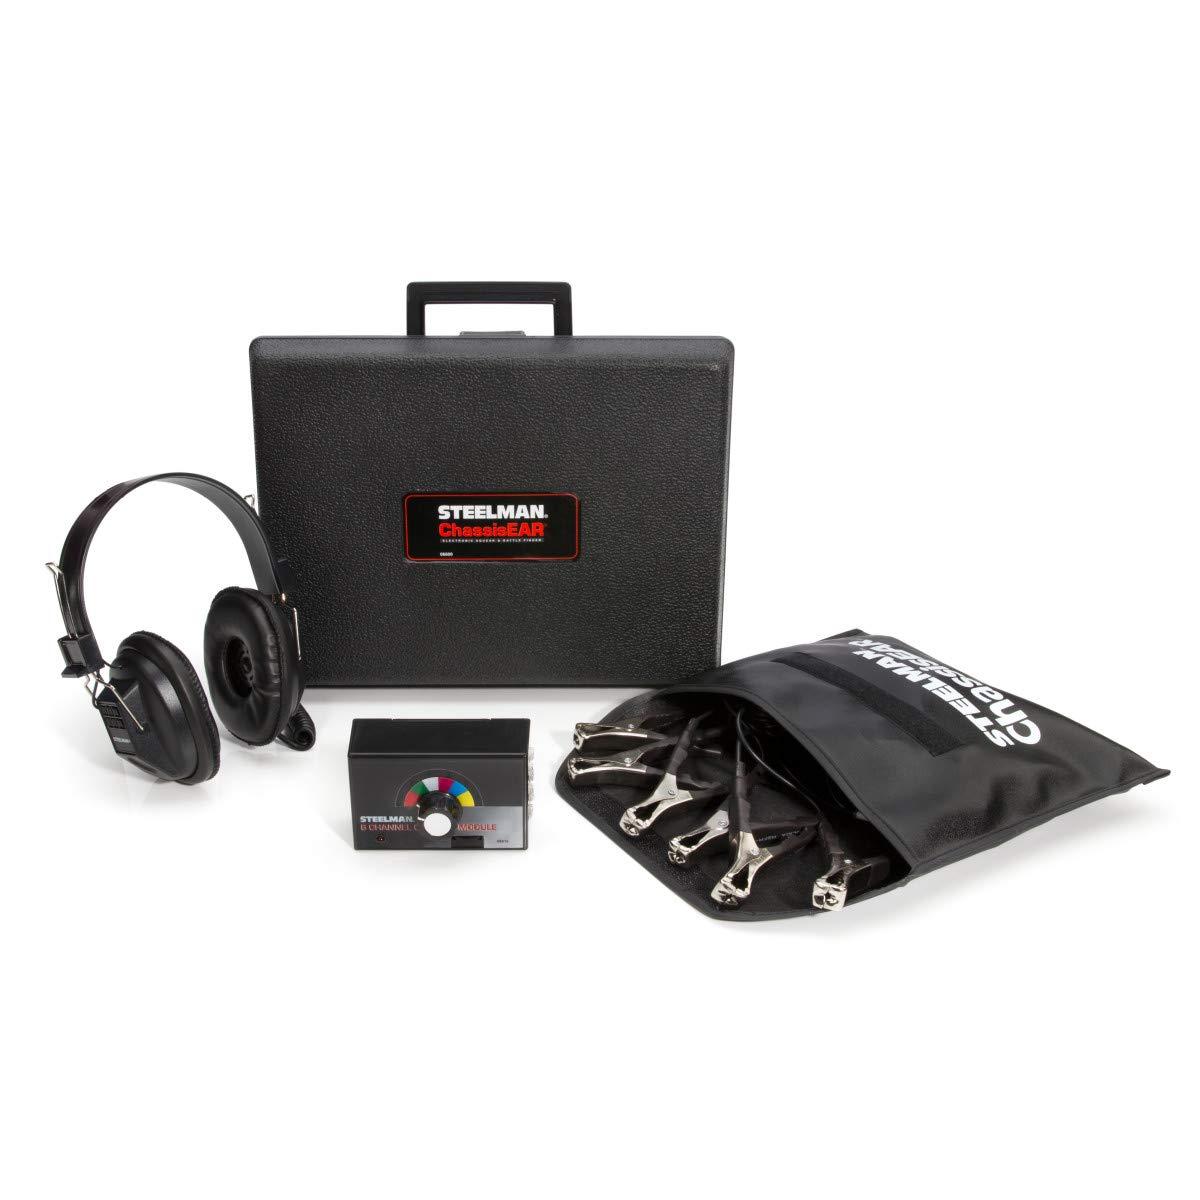 STEELMAN 06600 ChassisEAR Stethoscope